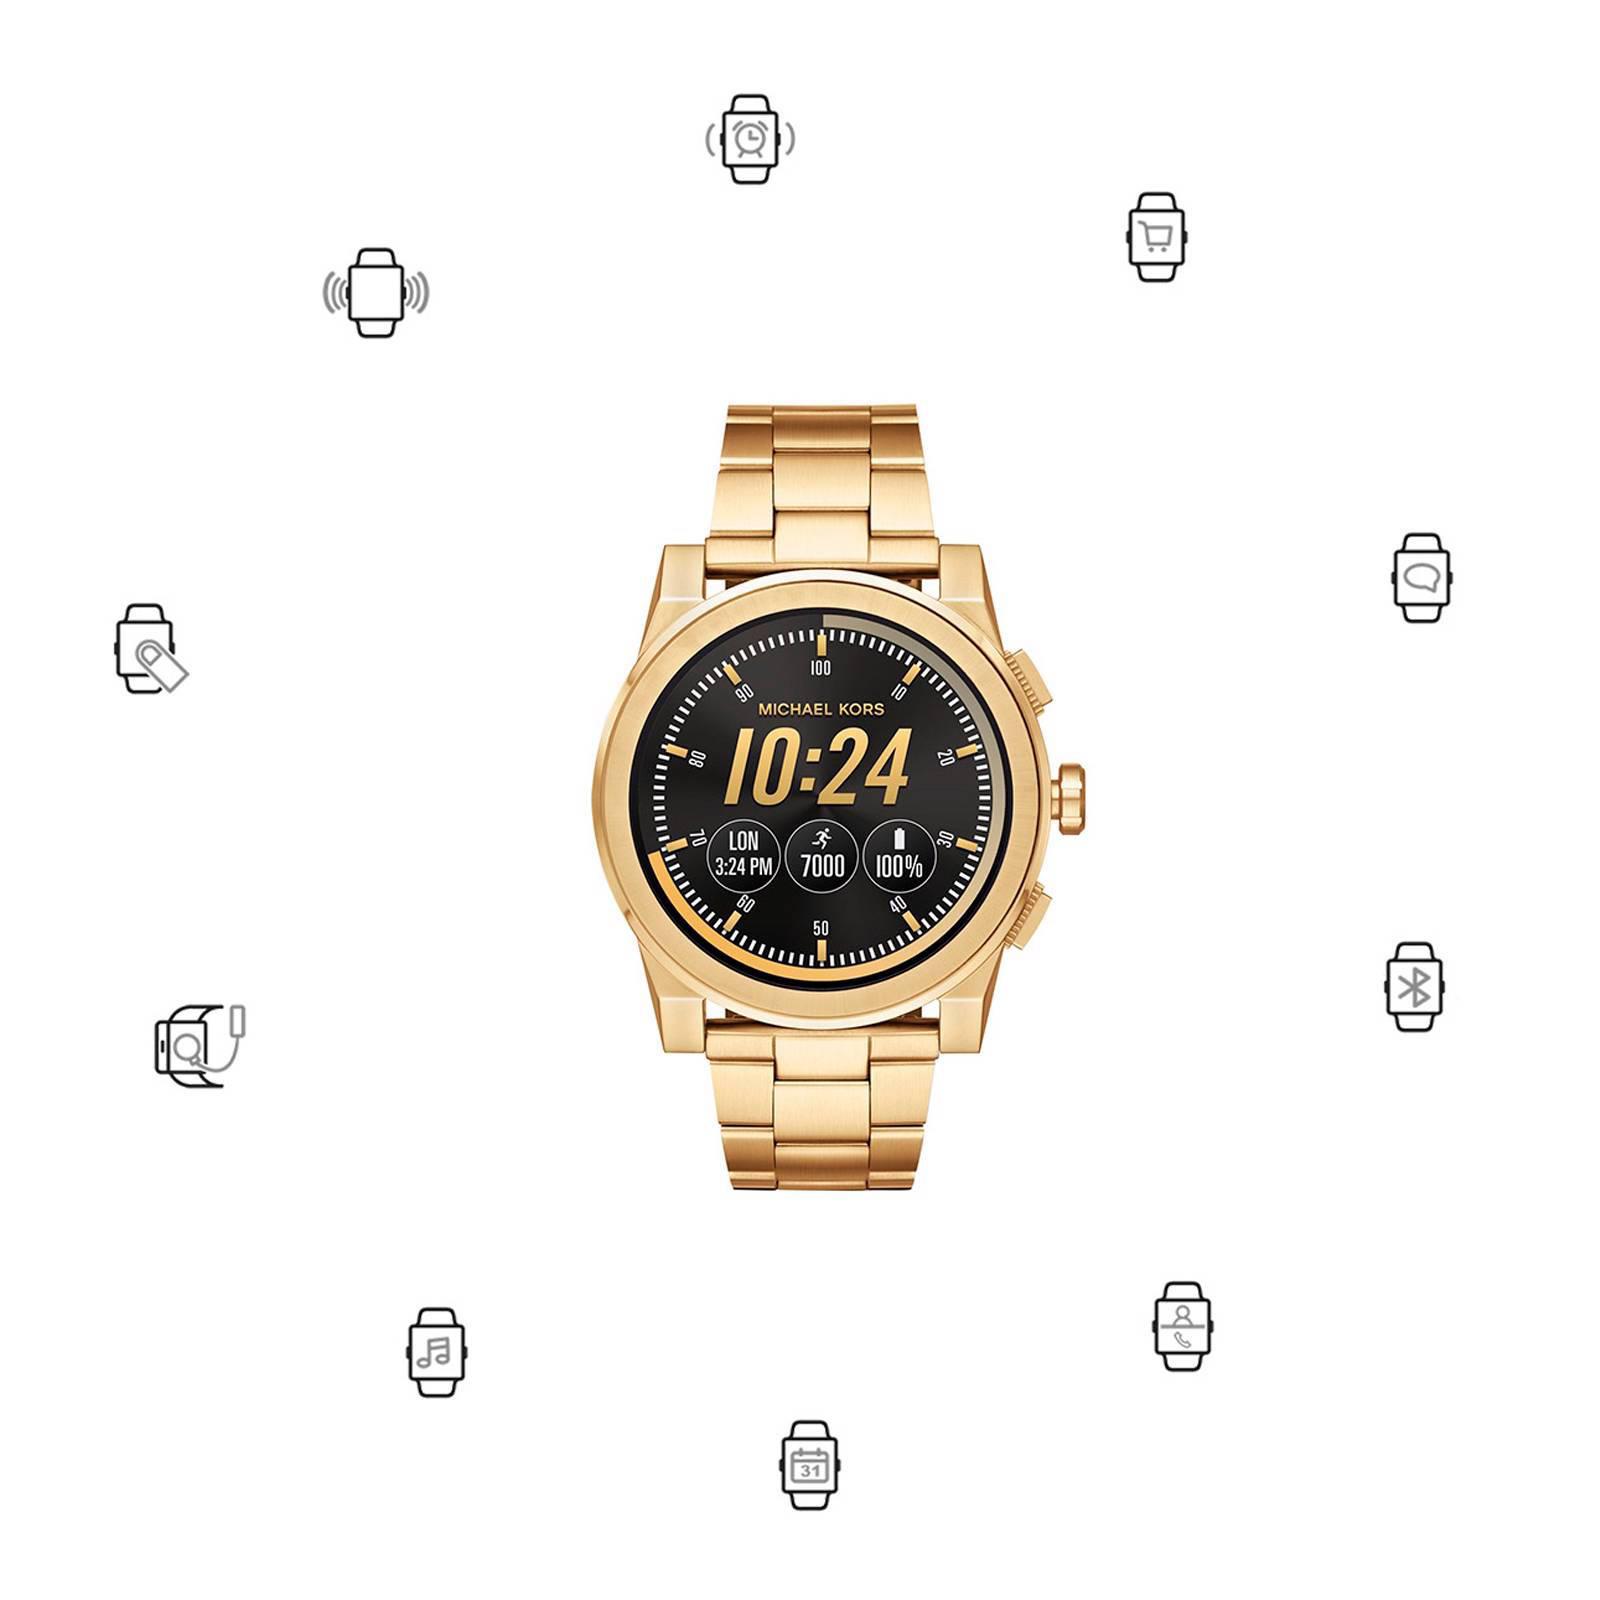 Acces Grayson smartwatch MKT5026